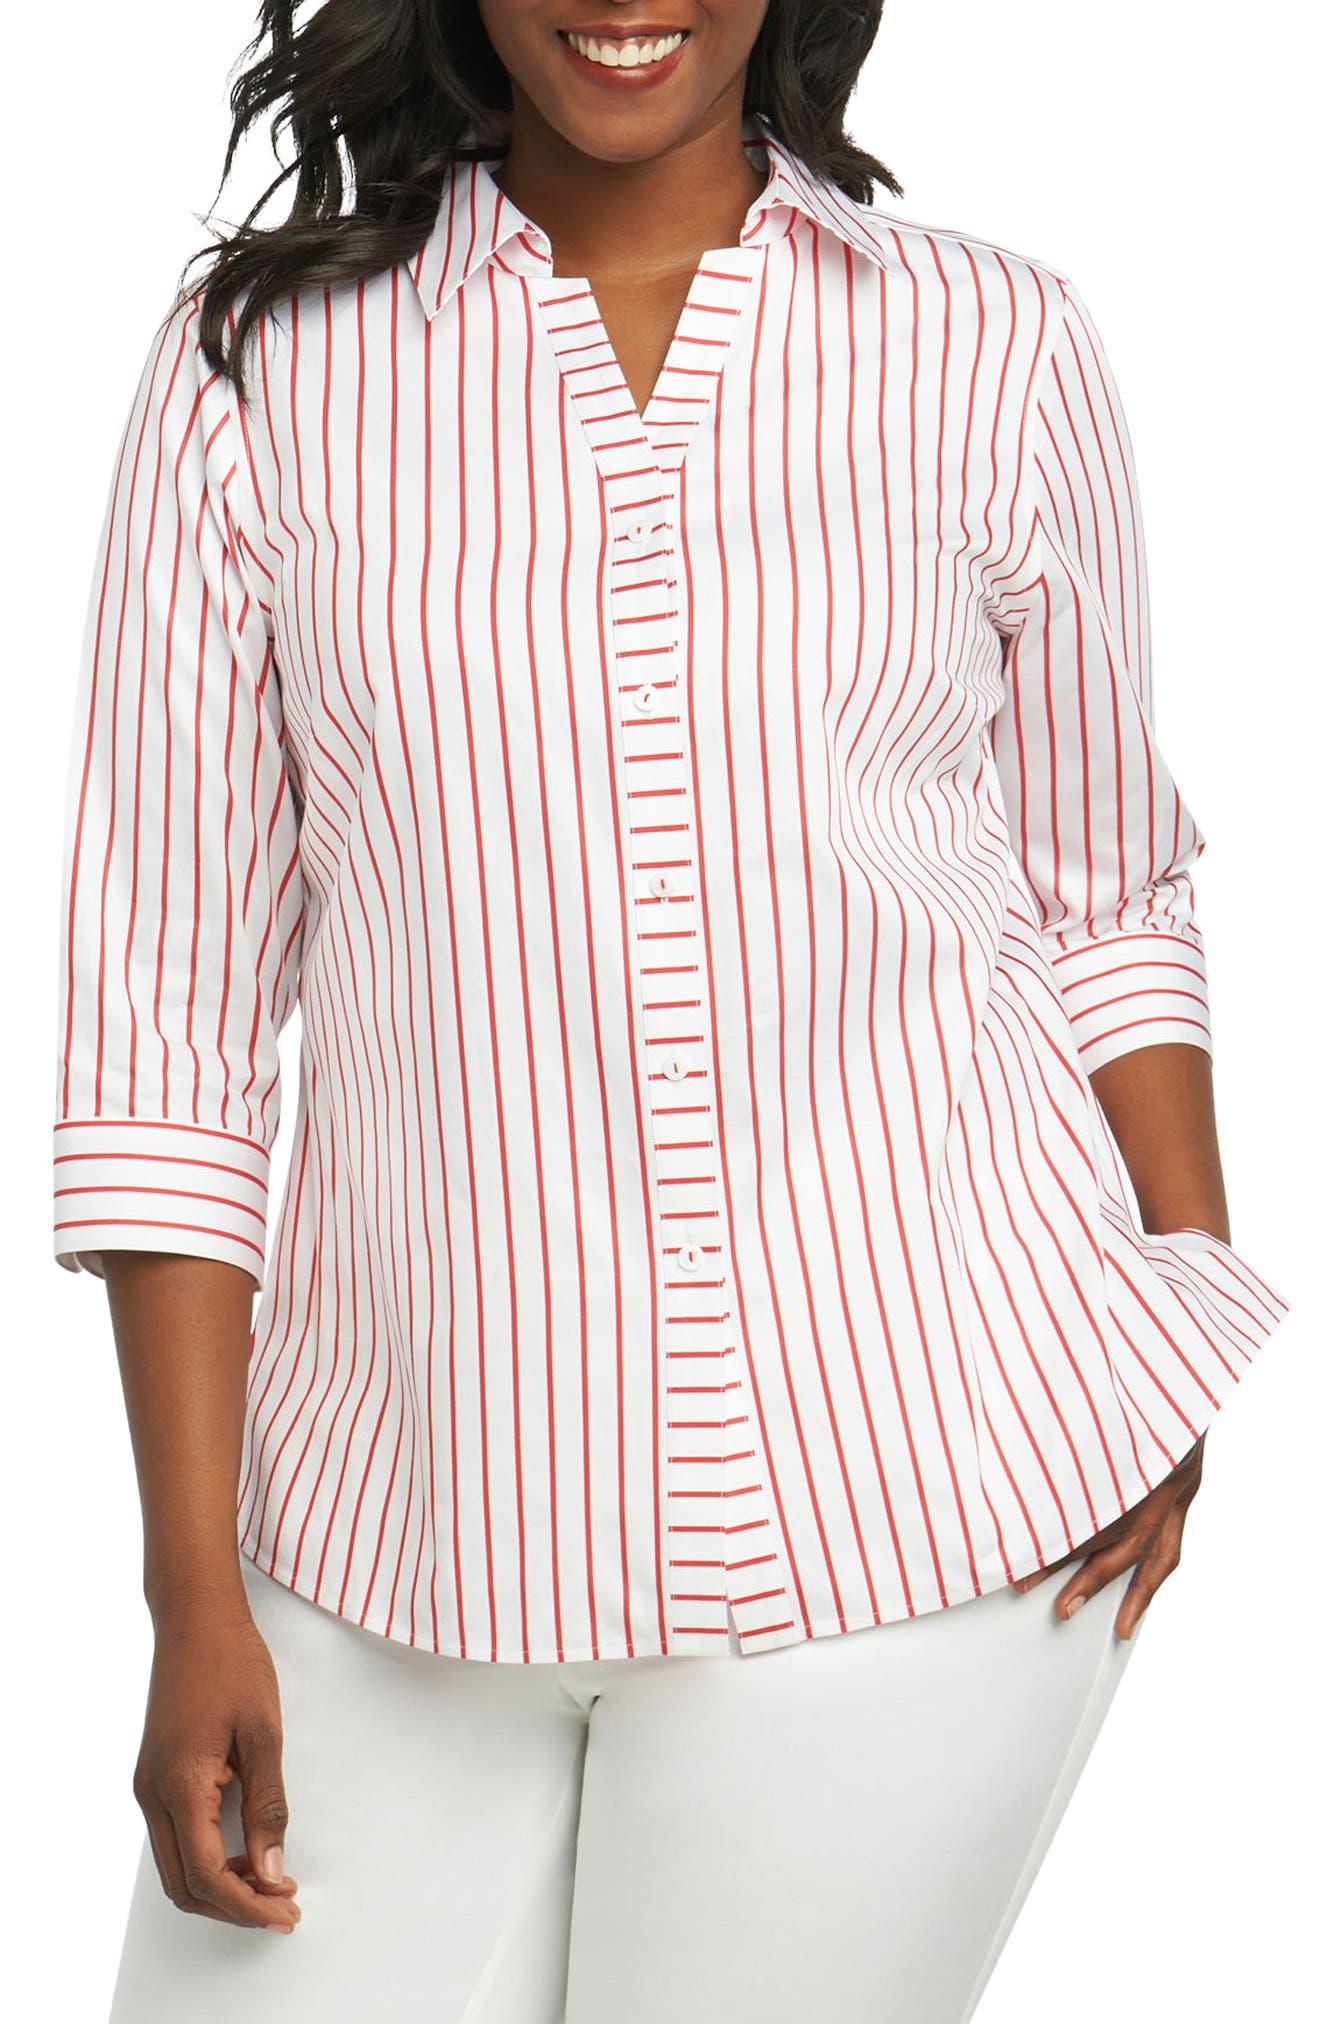 Alternate Image 1 Selected - Foxcroft Clio Sateen Stripe Shirt (Plus Size)